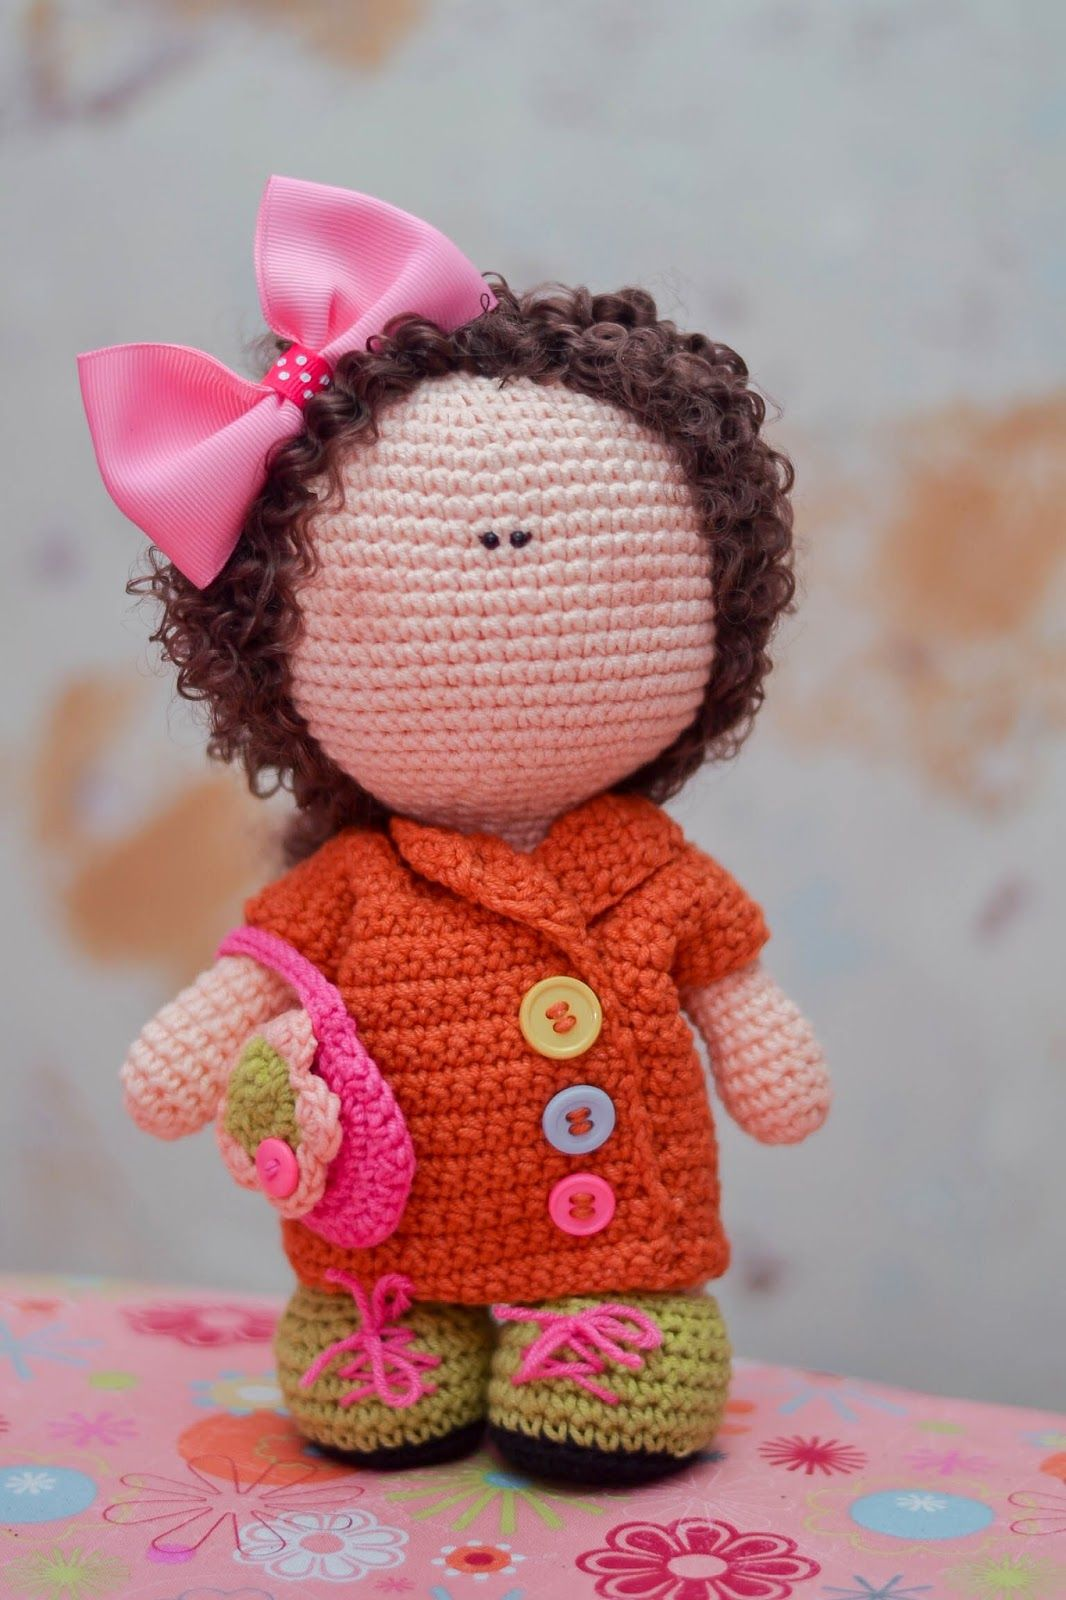 magic filament crochet and knitting creations pinterest amigurumi puppen und h keln. Black Bedroom Furniture Sets. Home Design Ideas